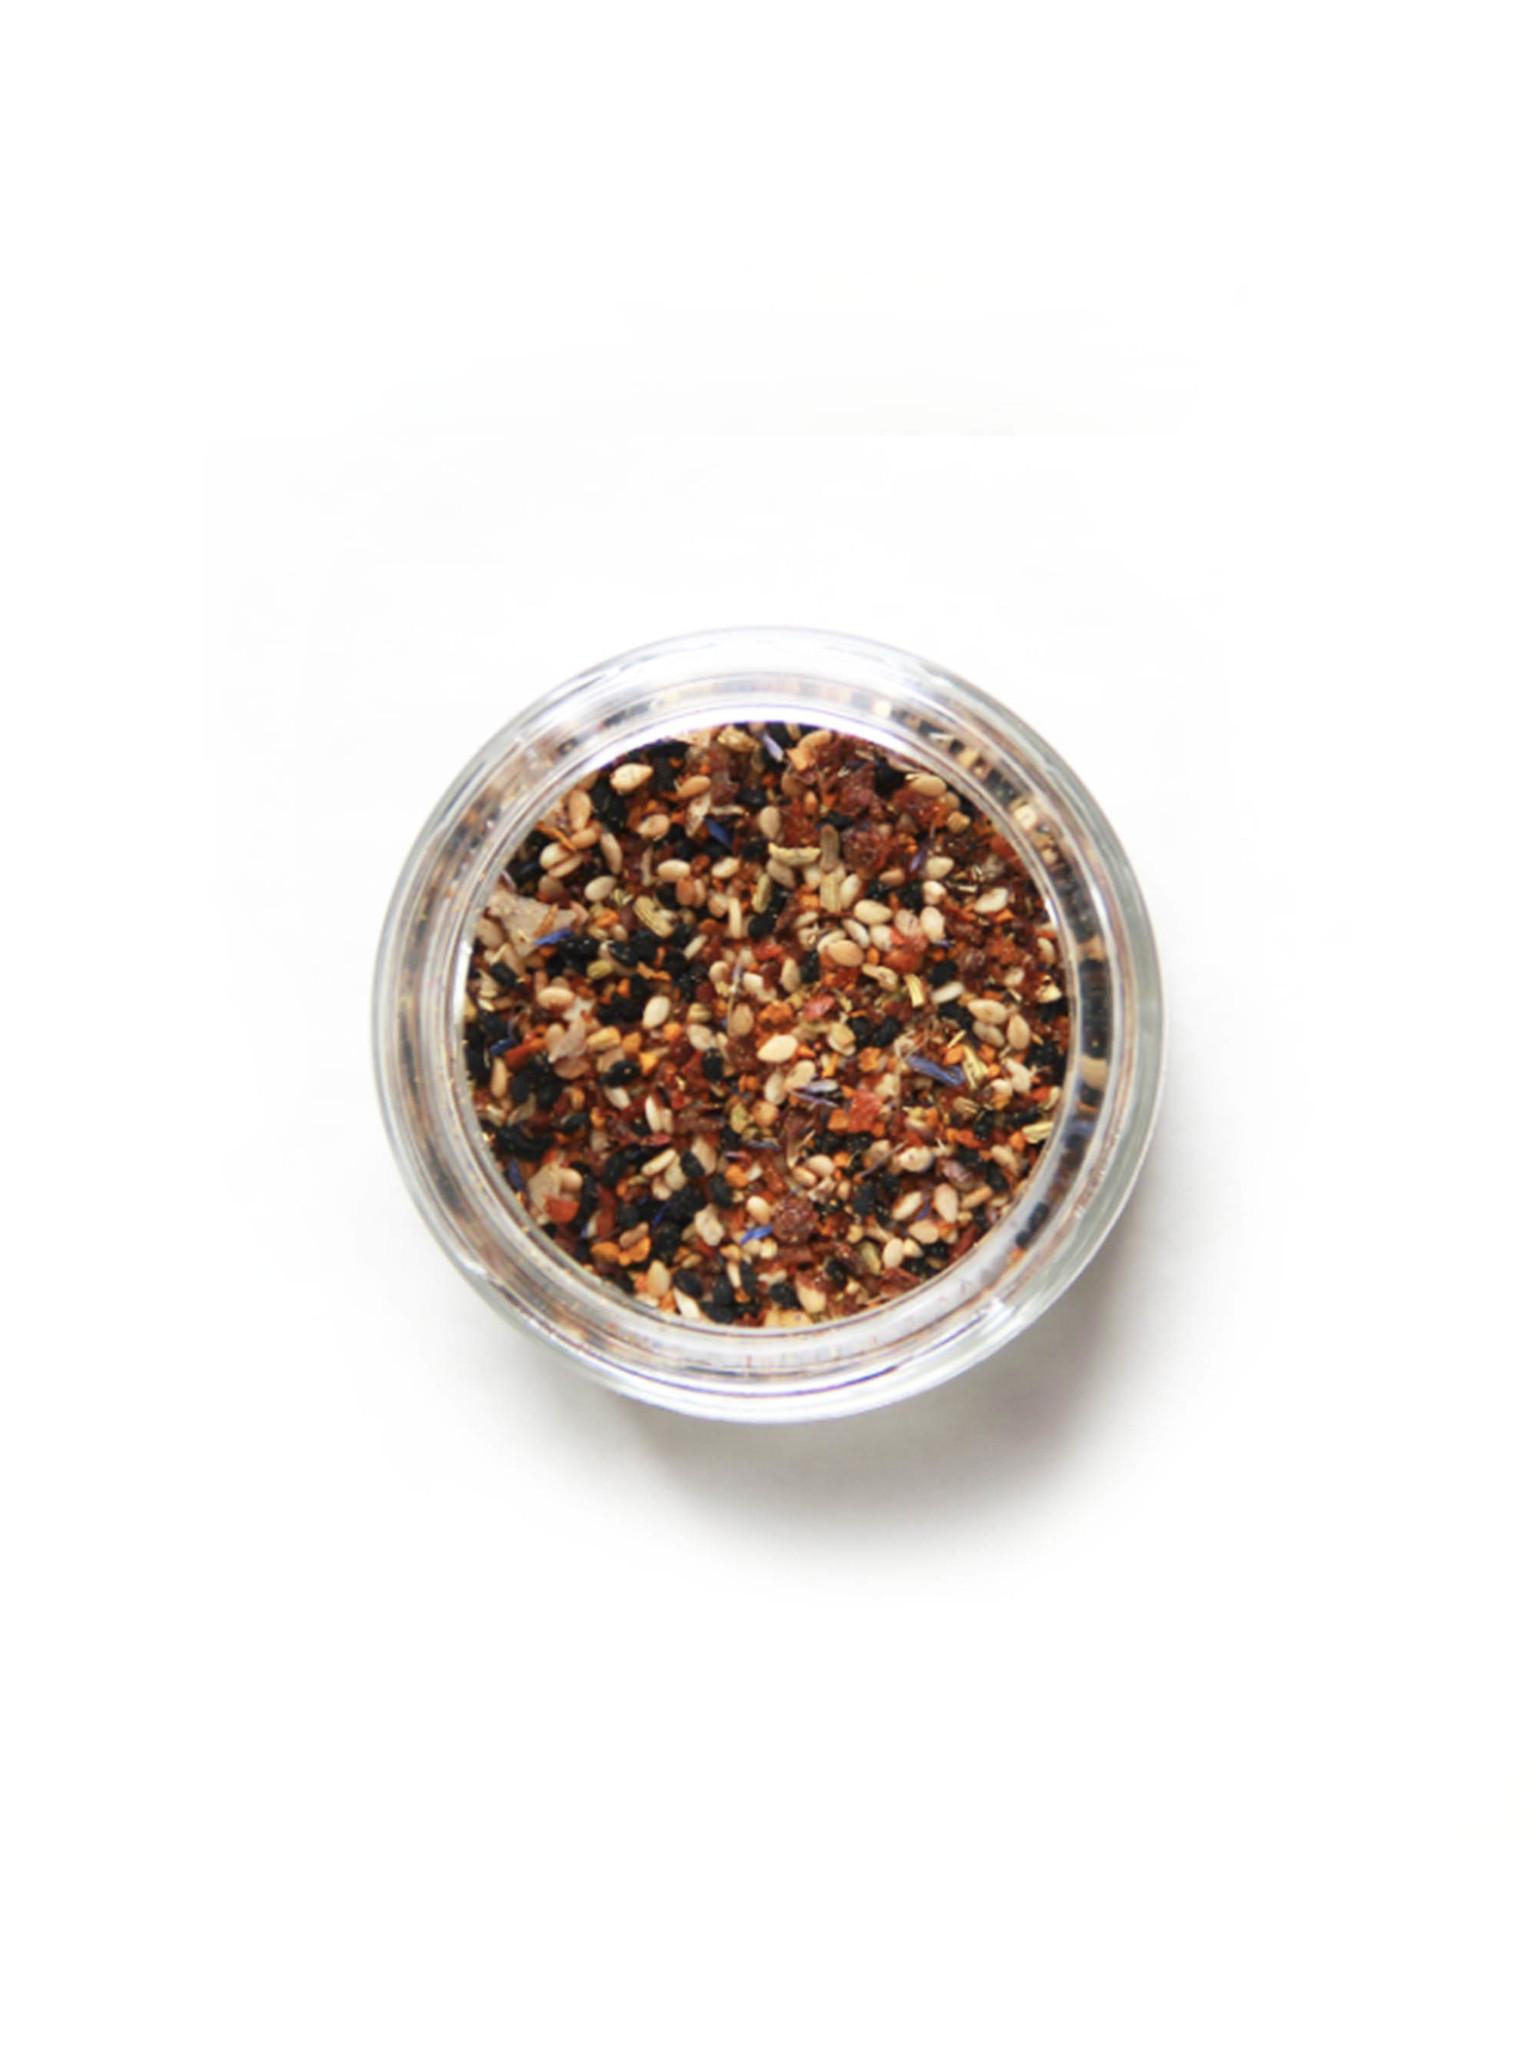 Curio Spice Co. Everything Rainbow Spice Mix, 2 oz.-2